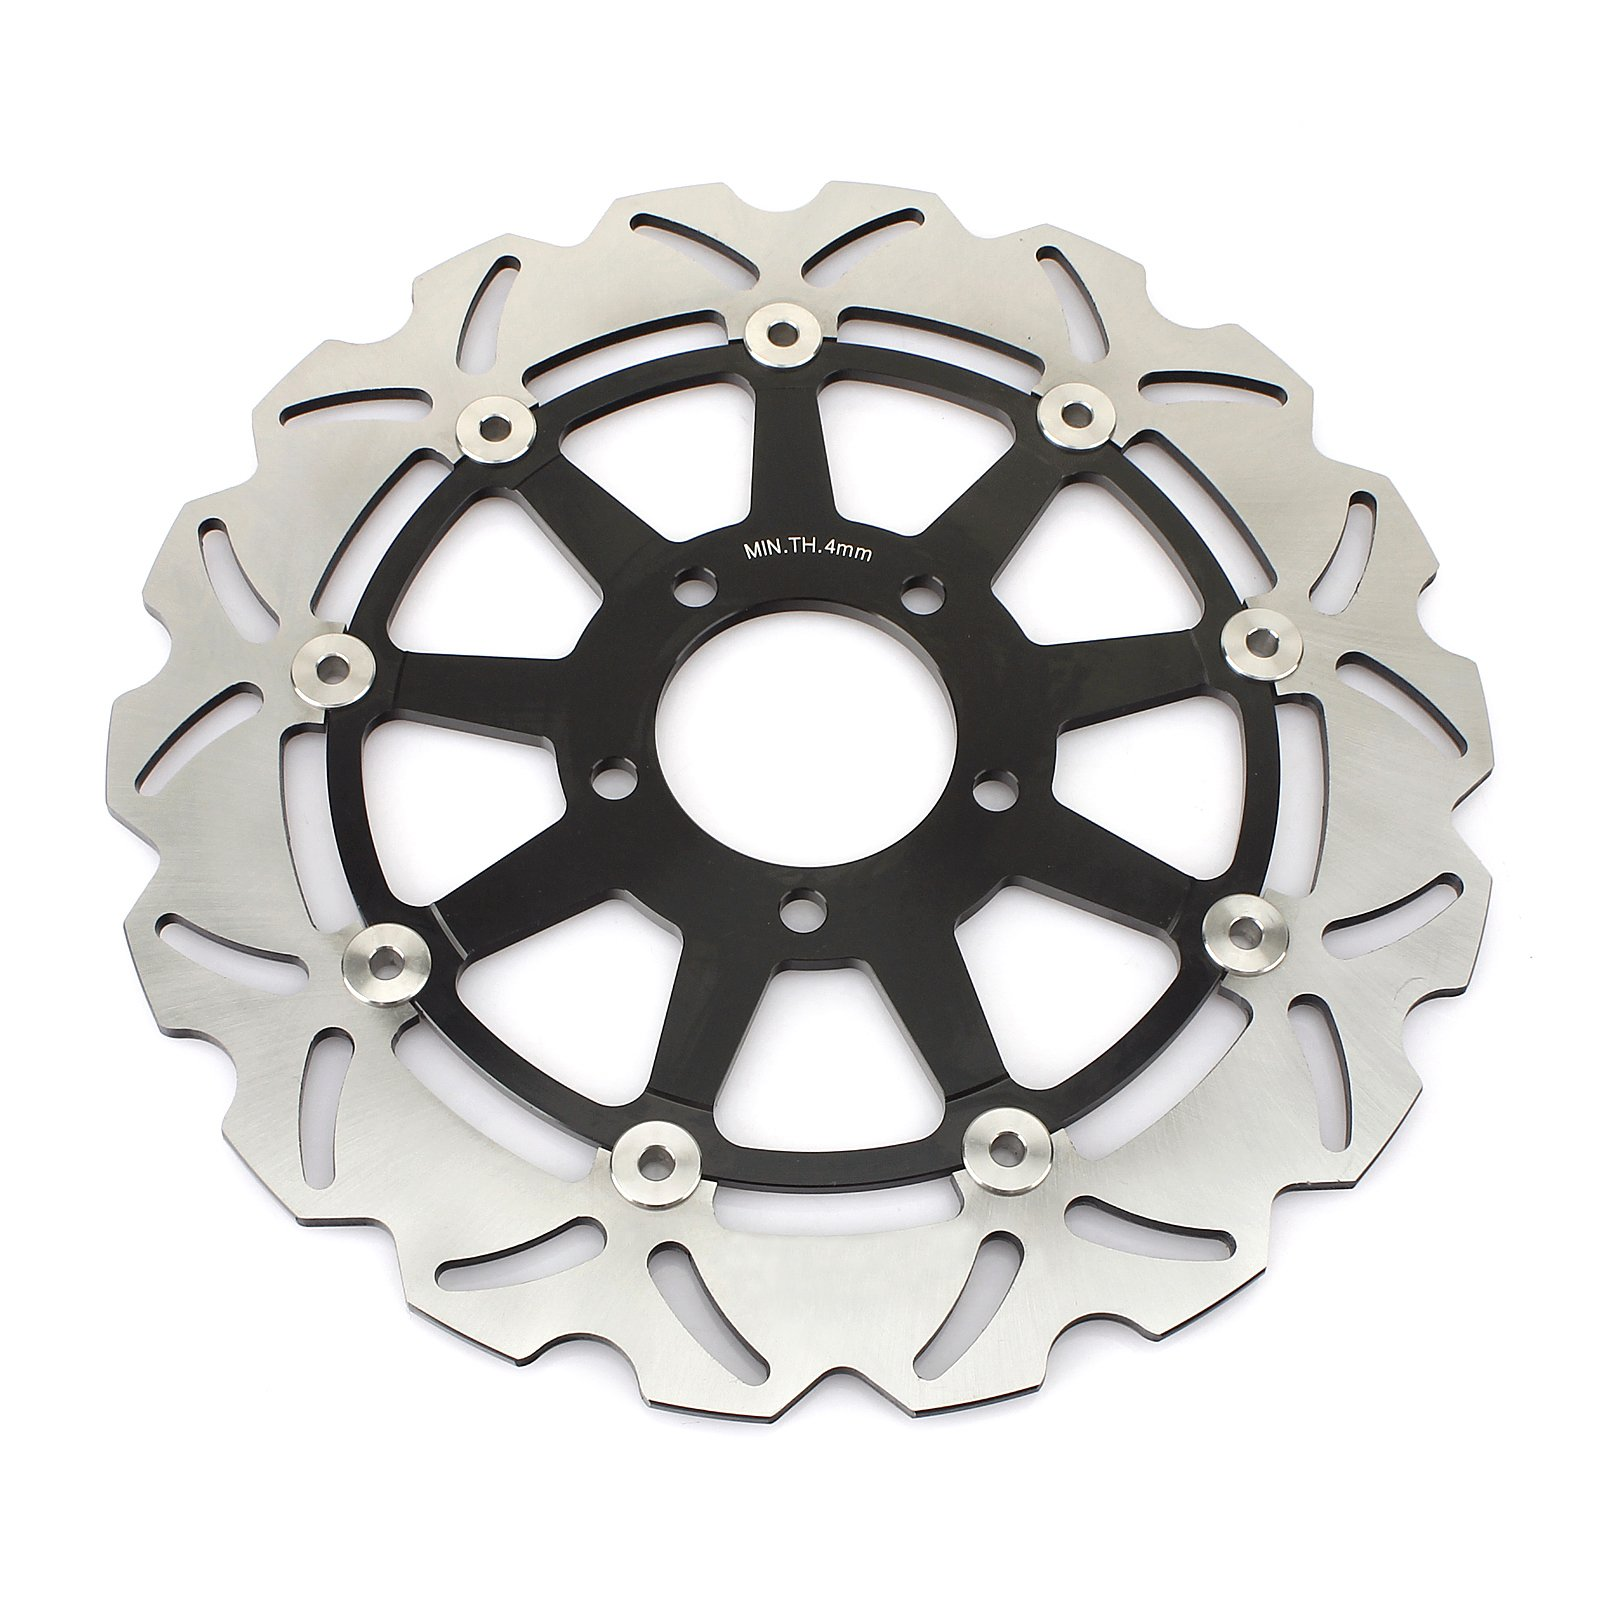 GSXR Front Brake Discs Rotors for Suzuki GSXR600 GSXR750 1997-2003 GSXR1000 2001 2002 Hayabusa GSX1300R 1999-2007 TL1000R TL1000S 98-01 by TARAZON (Image #3)